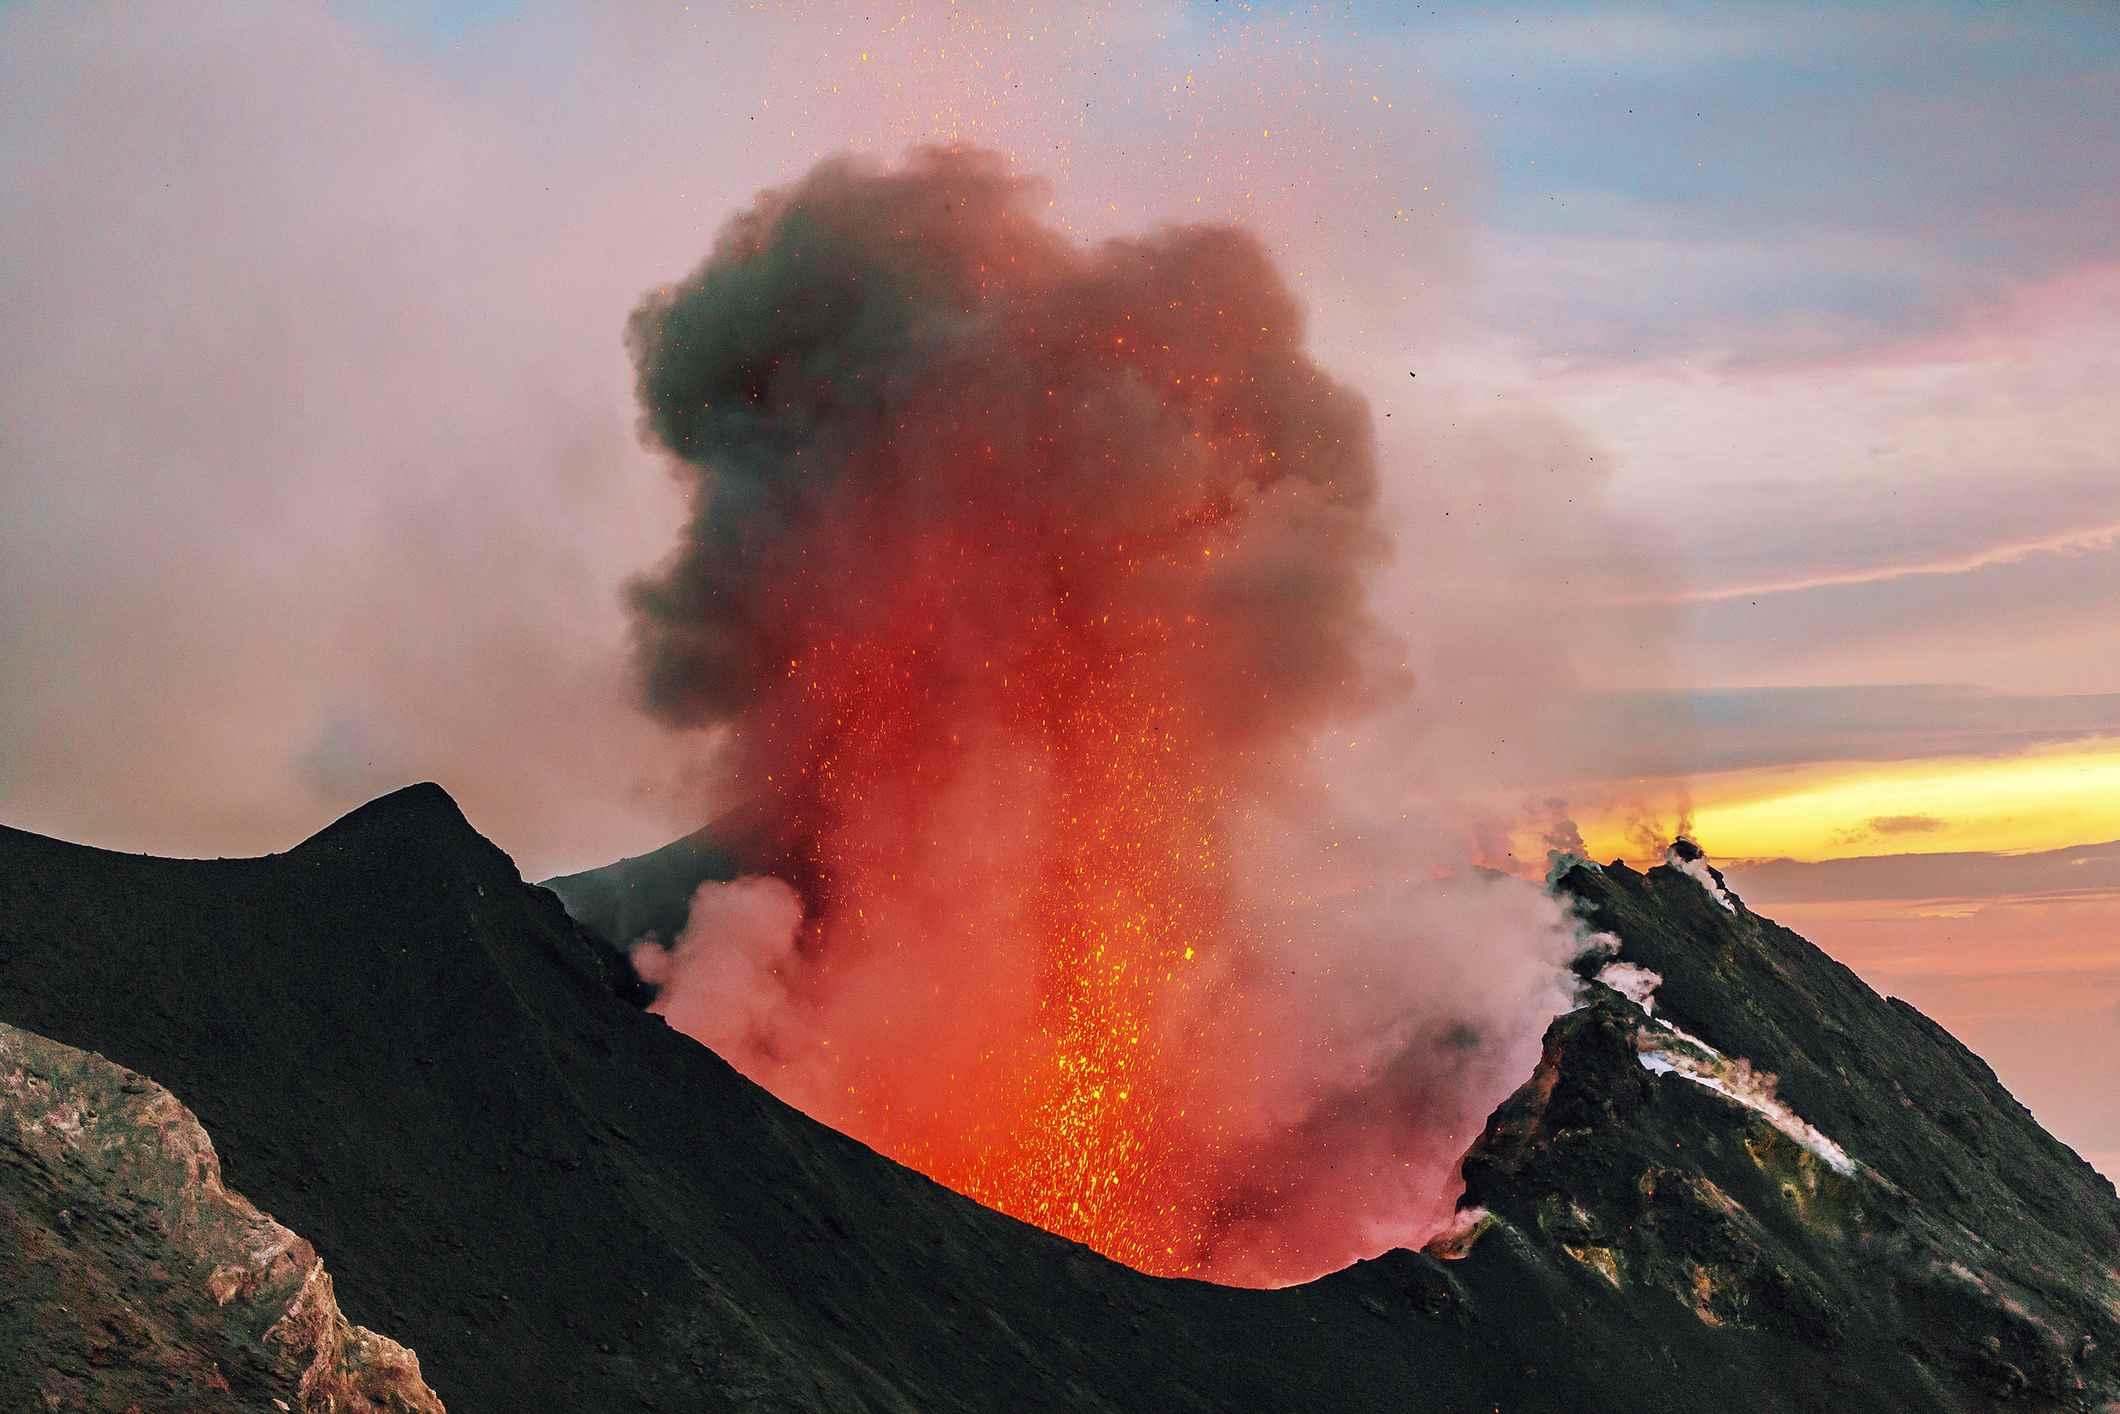 Italy, Aeolian Islands, Stromboli, volcanic eruption, lava bombs